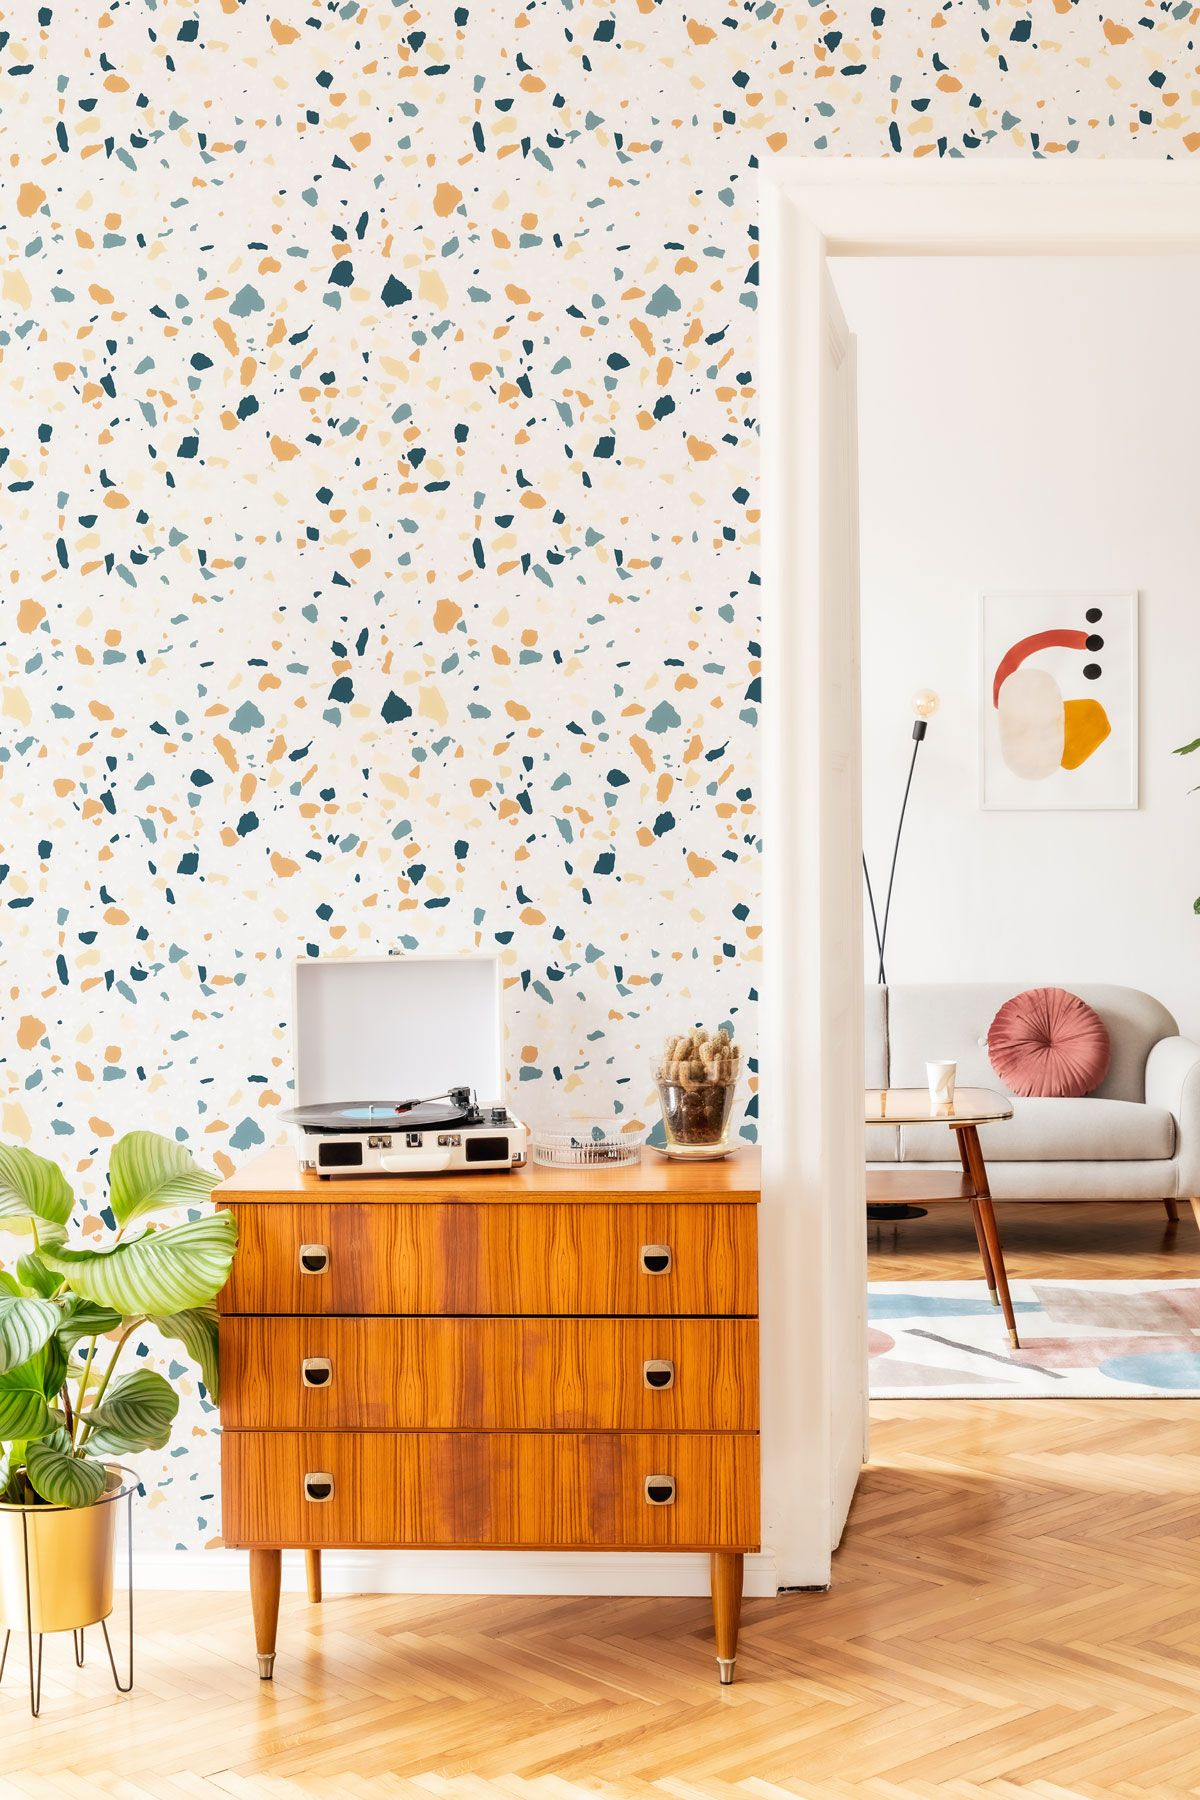 Orange Terrazzo Basic Peel And Stick Removable Wallpaper 6530 Wallpaper Decor Removable Wallpaper Decor